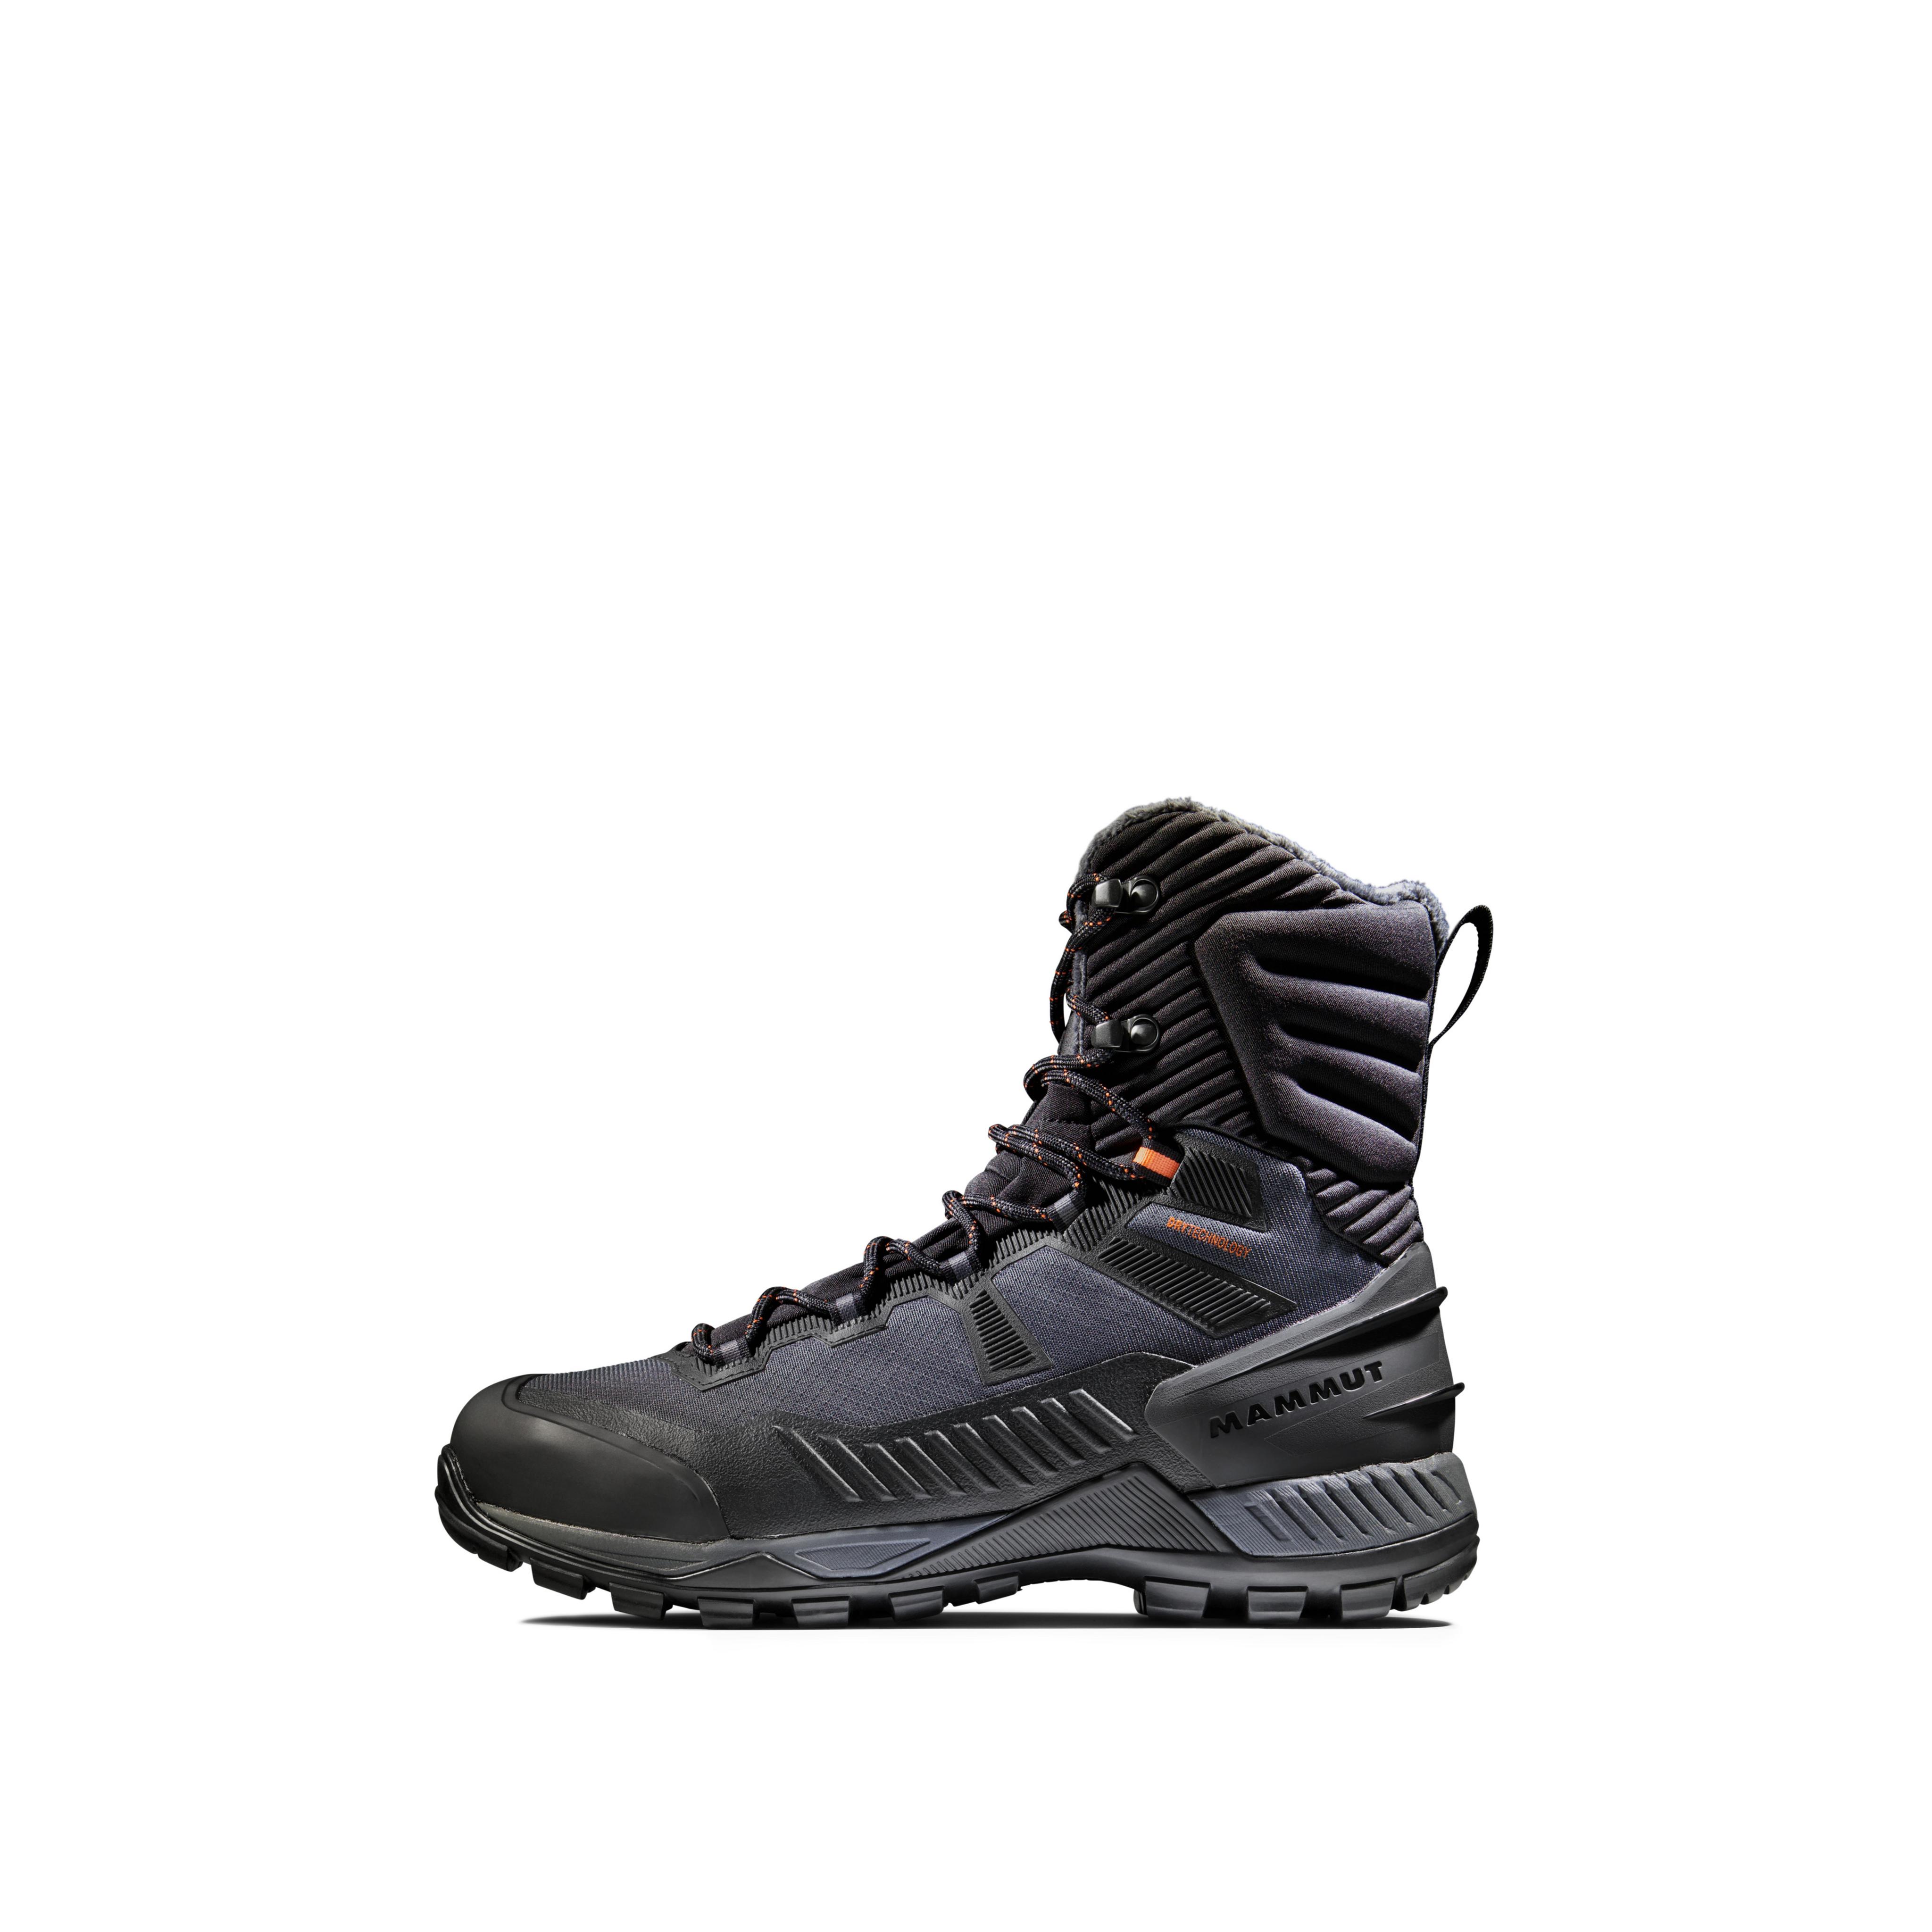 Blackfin III WP High Men - black, UK 6.5 thumbnail